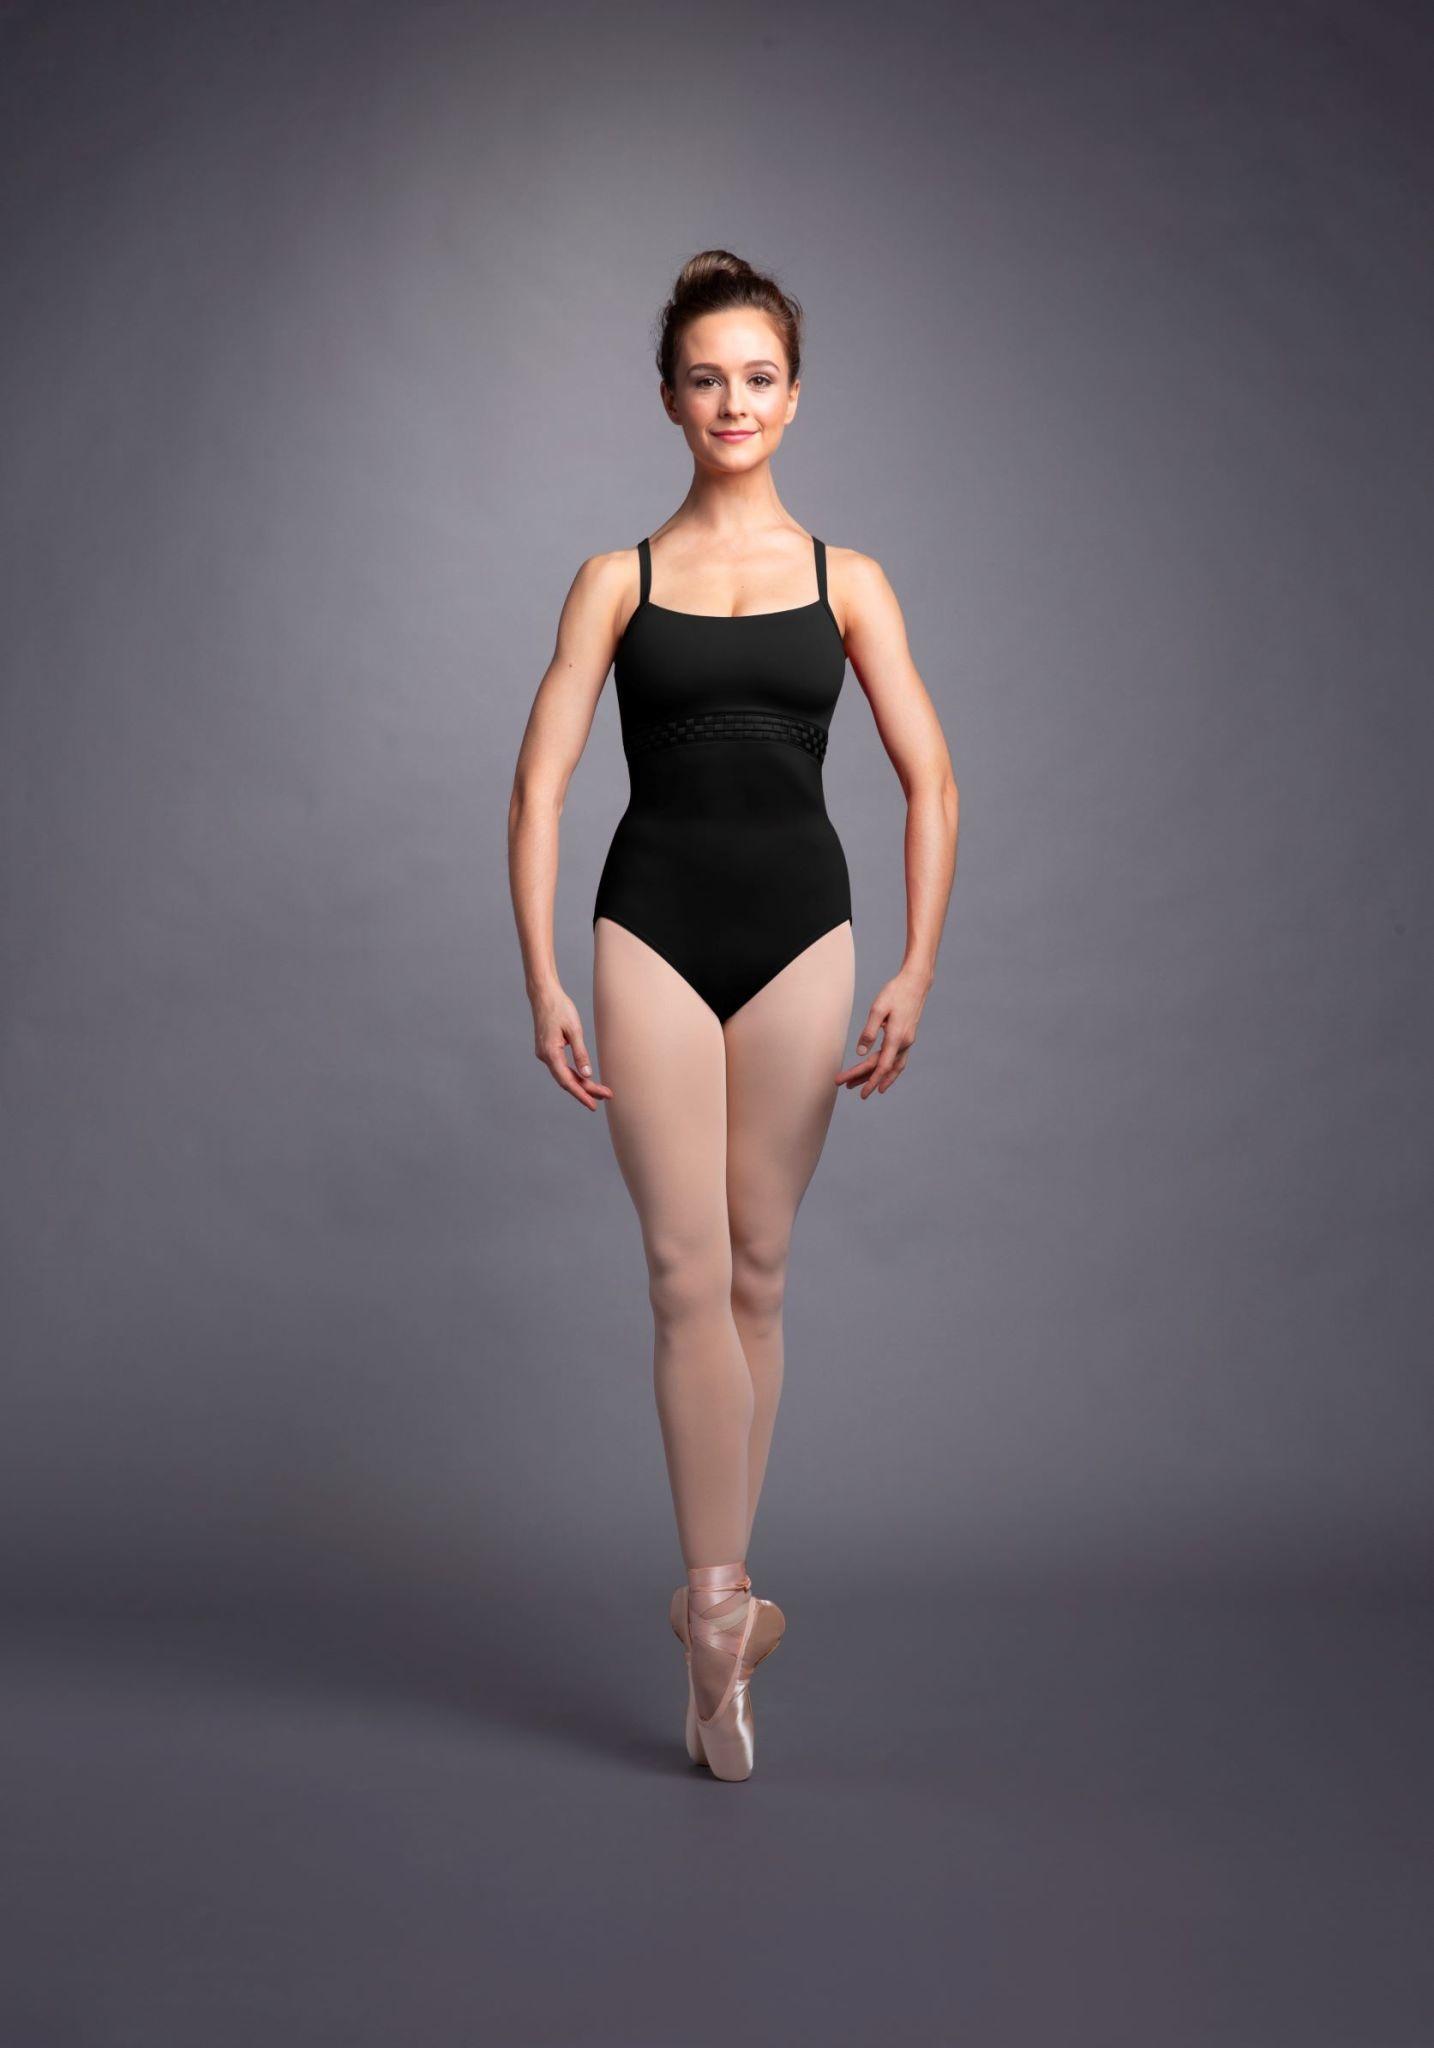 Bloch L3597 Bodysuit for Adults